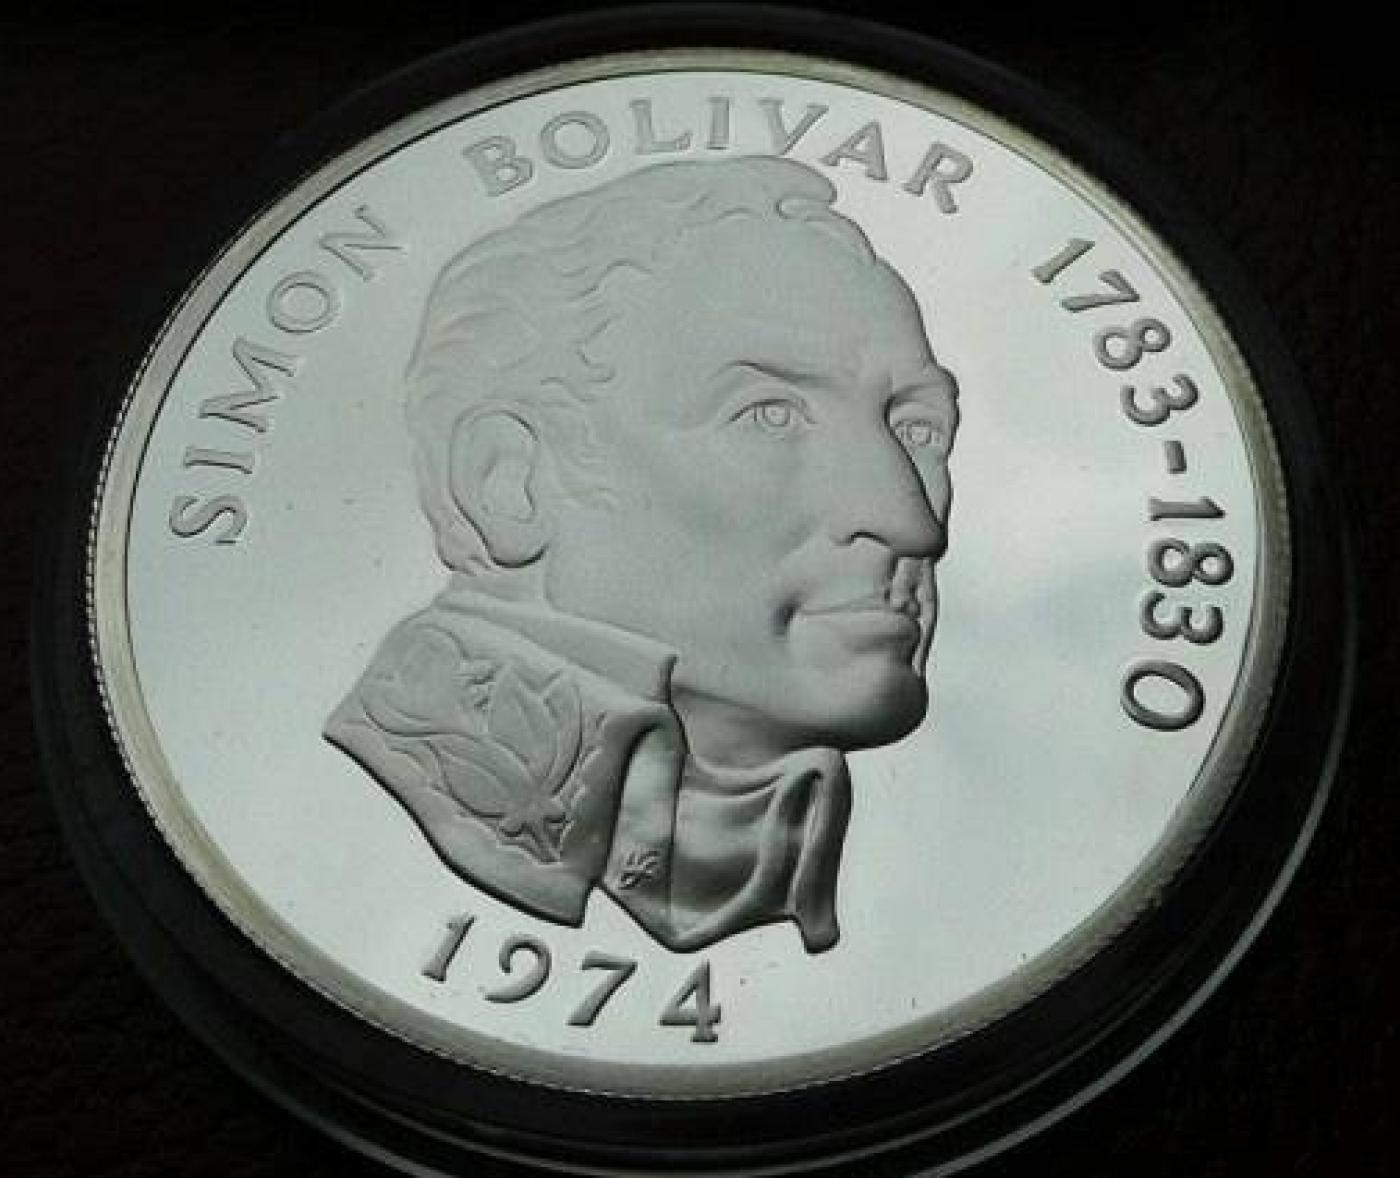 1983 FM SILVER PANAMA RARE 500 MINTED UNCIRCULATED 20 BALBOAS BIRTH OF BOLIVAR